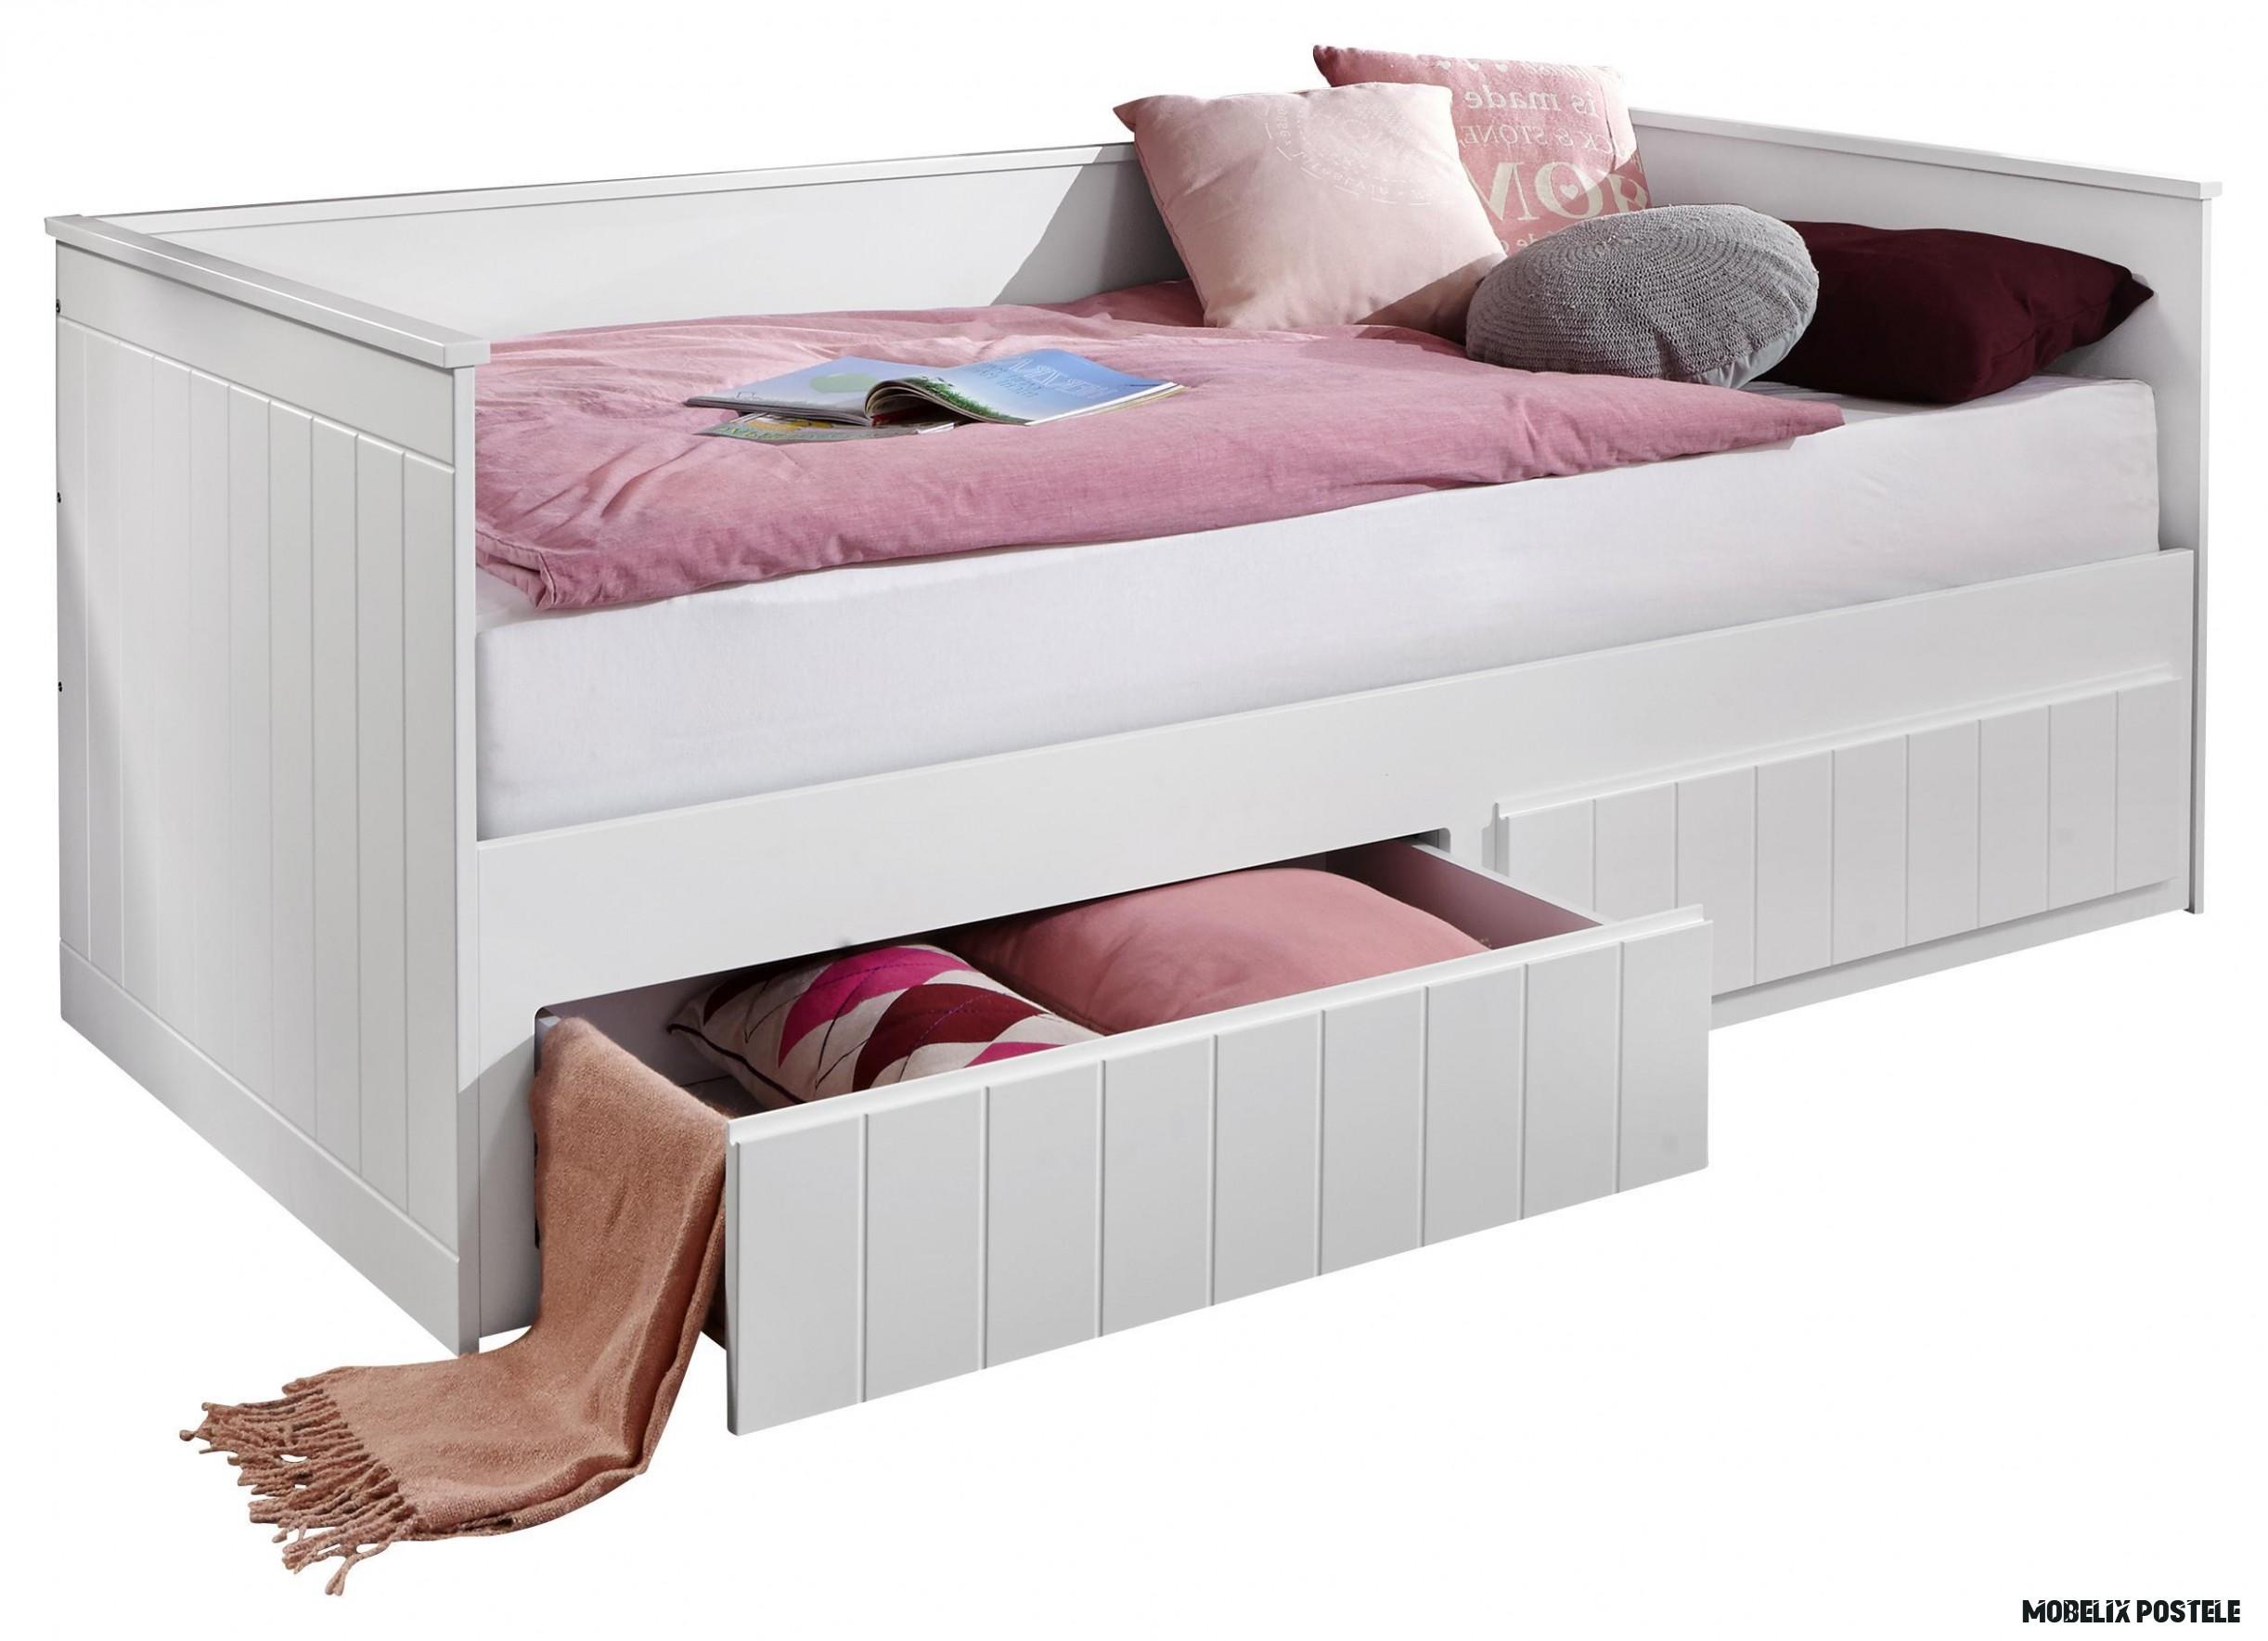 Suočiti Preporuka Mobilizirati dětská postel mobelix